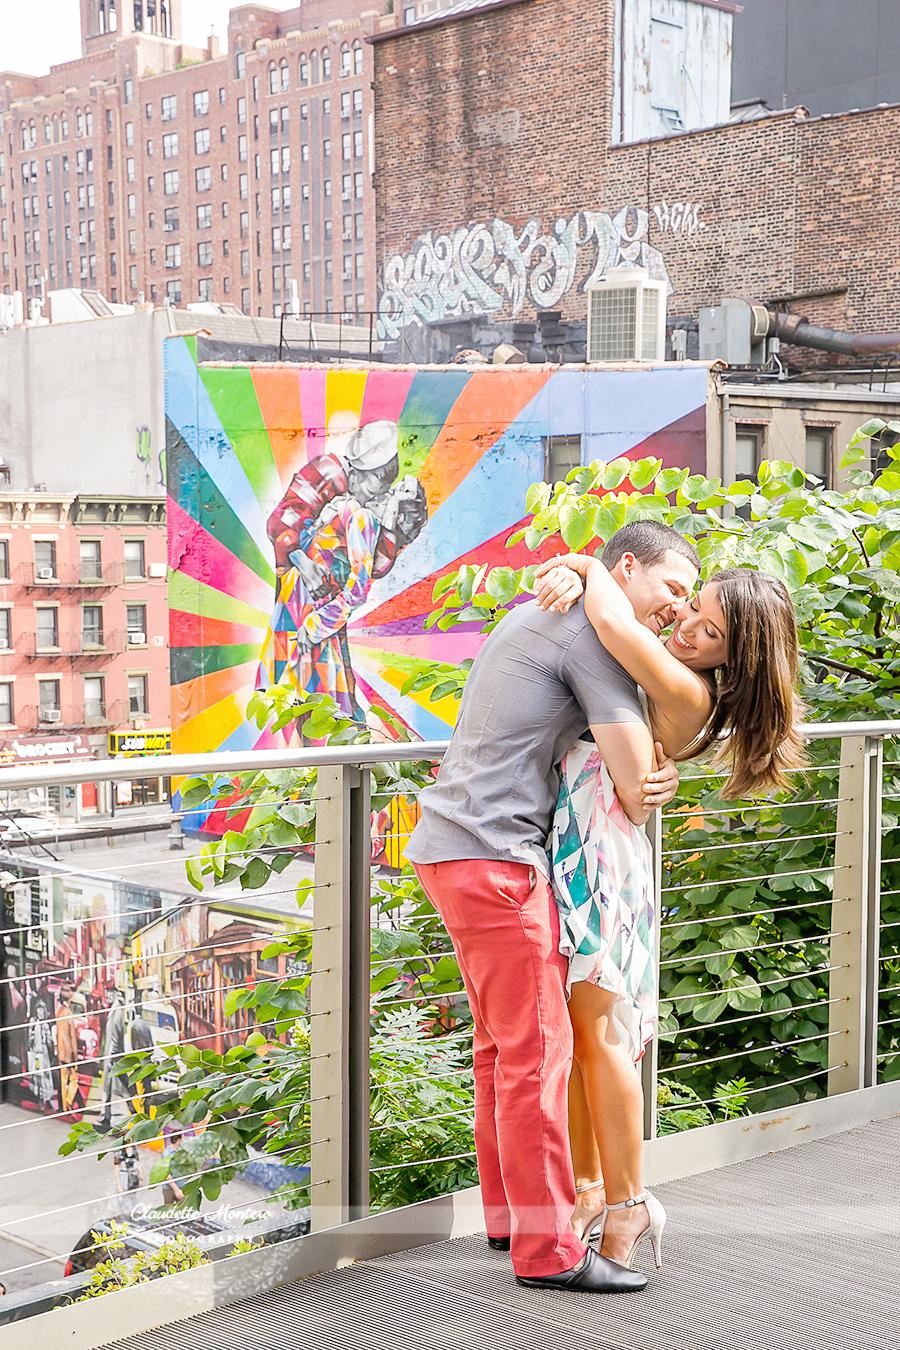 claudette-montero-photography-amaris-emmanuel-new-york-engagement-session-yaska-crespo-wedding-planner-web-logo-9483